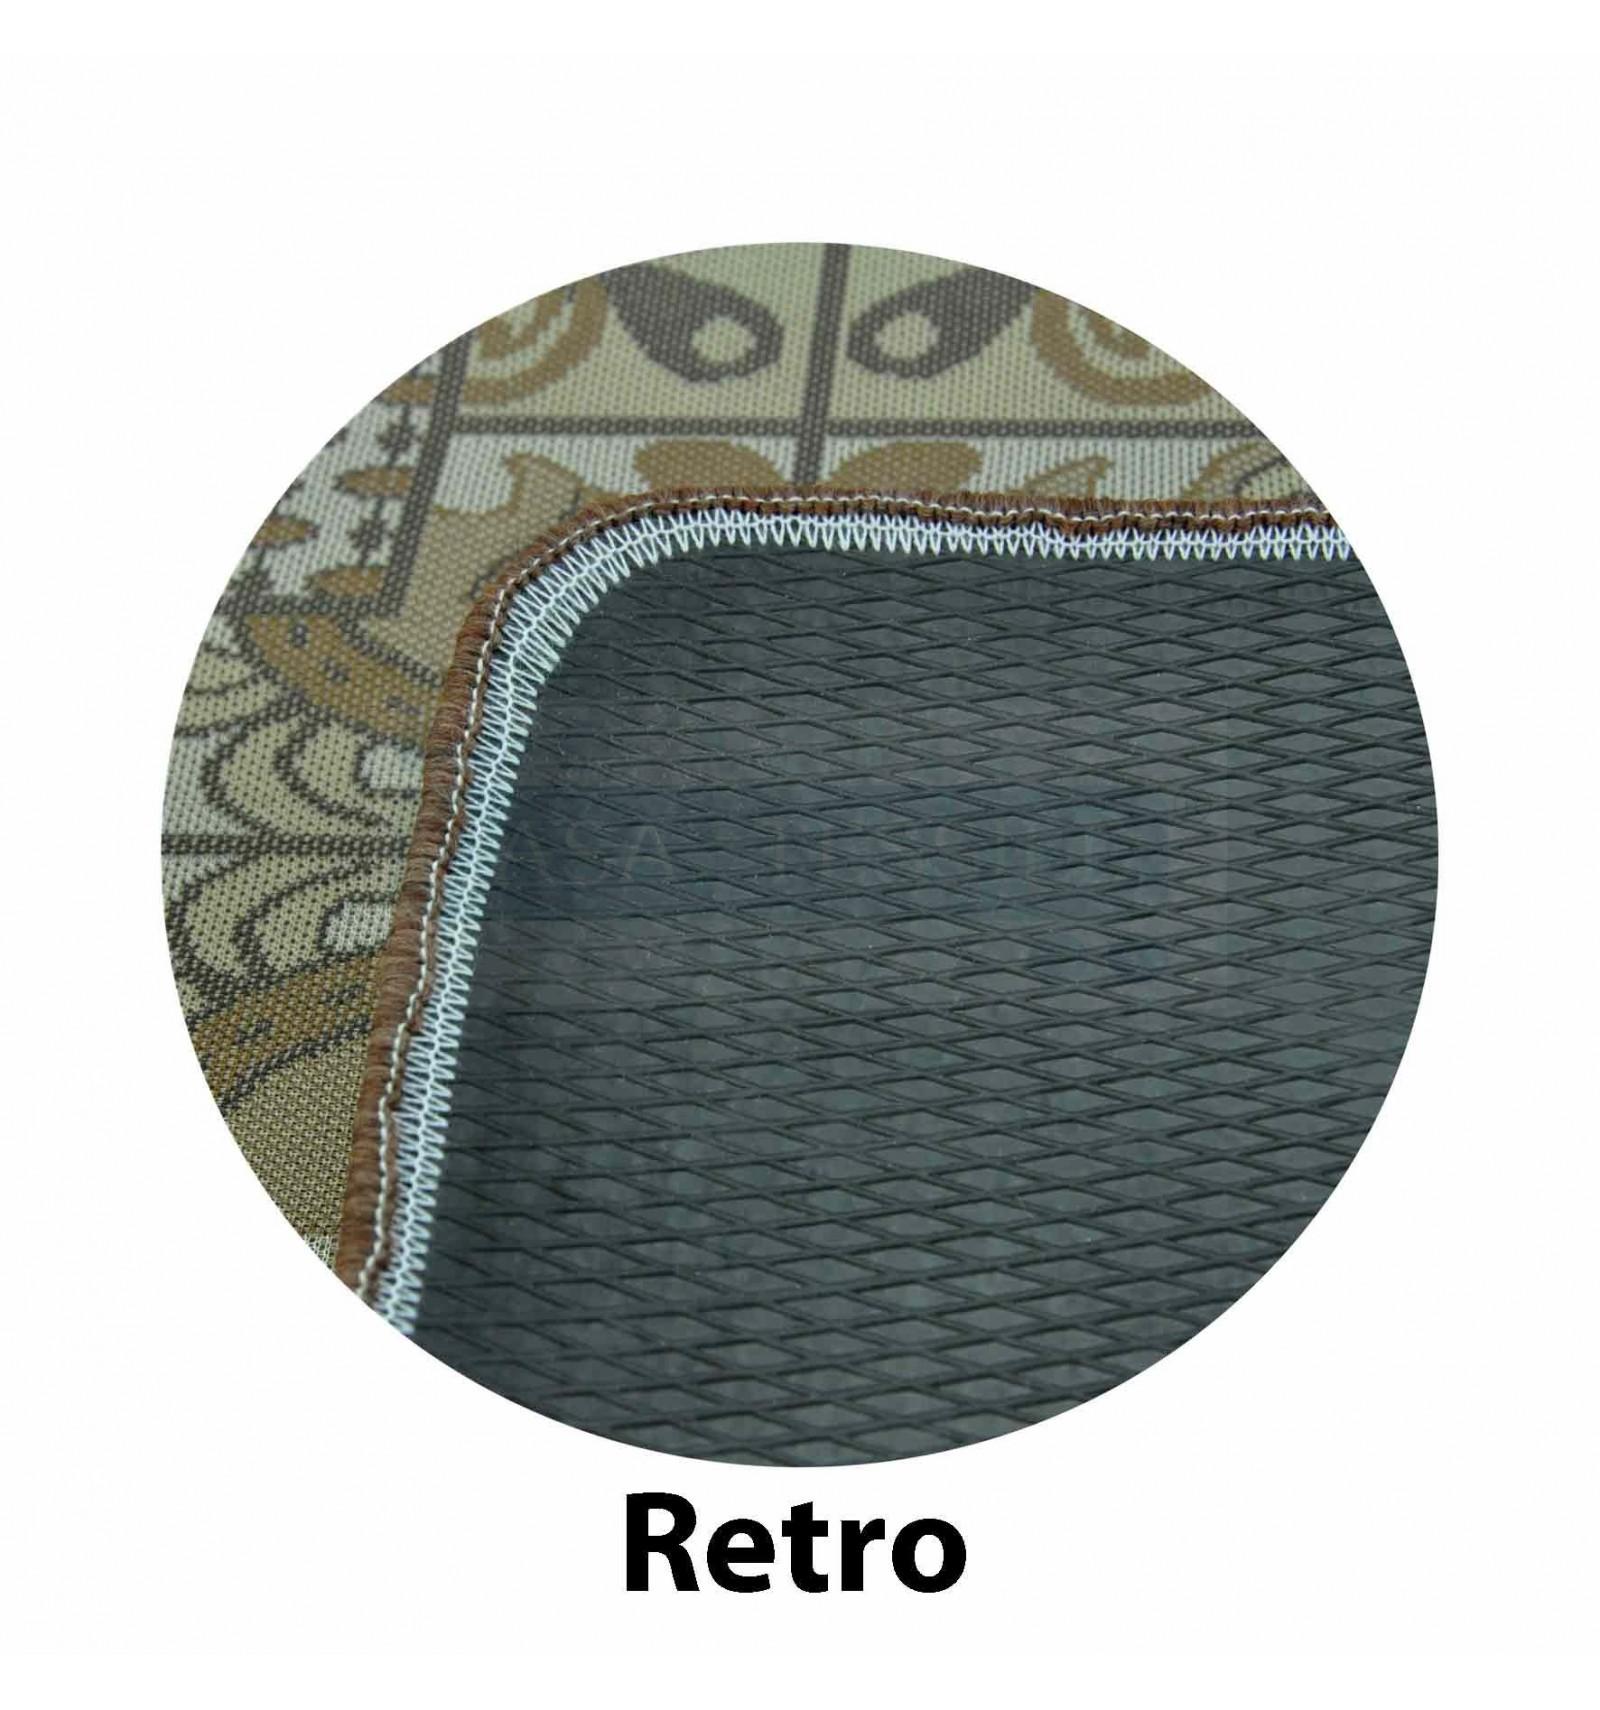 Maiolica-liscio-tappeto-passatoia-varie-misure miniatura 11